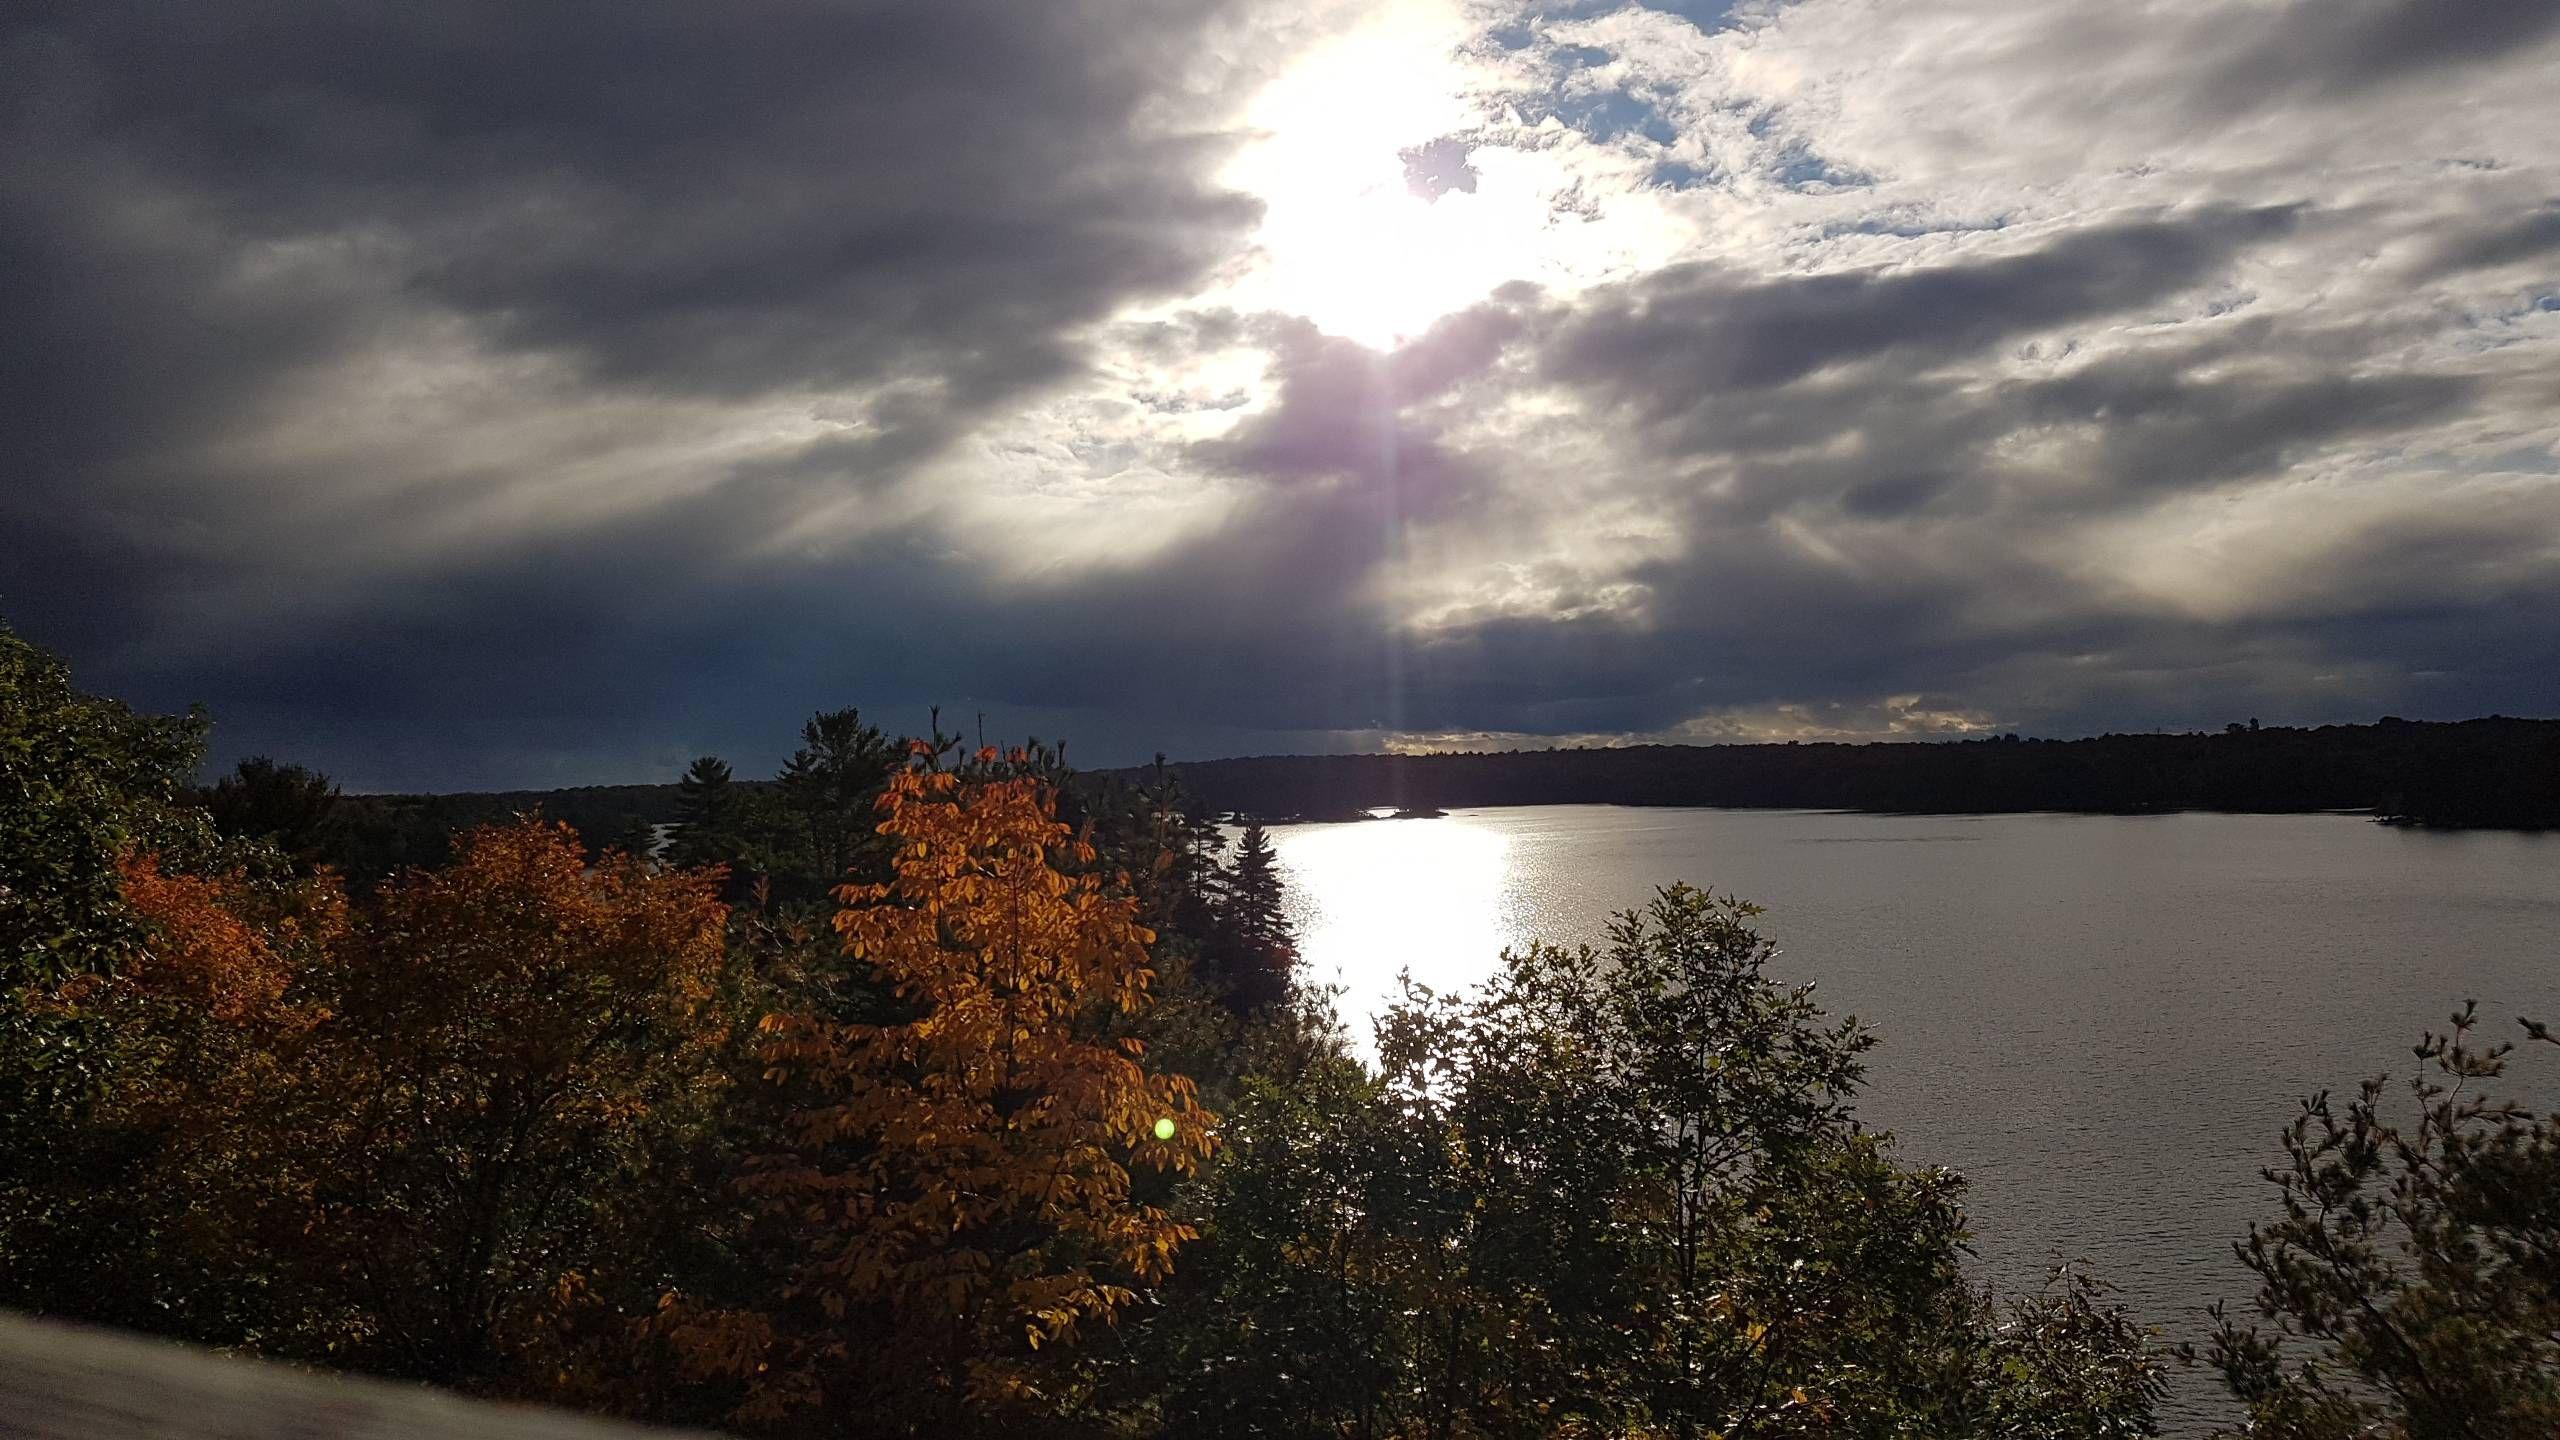 [2560x1440] Sugar Lake Ontario Canada.